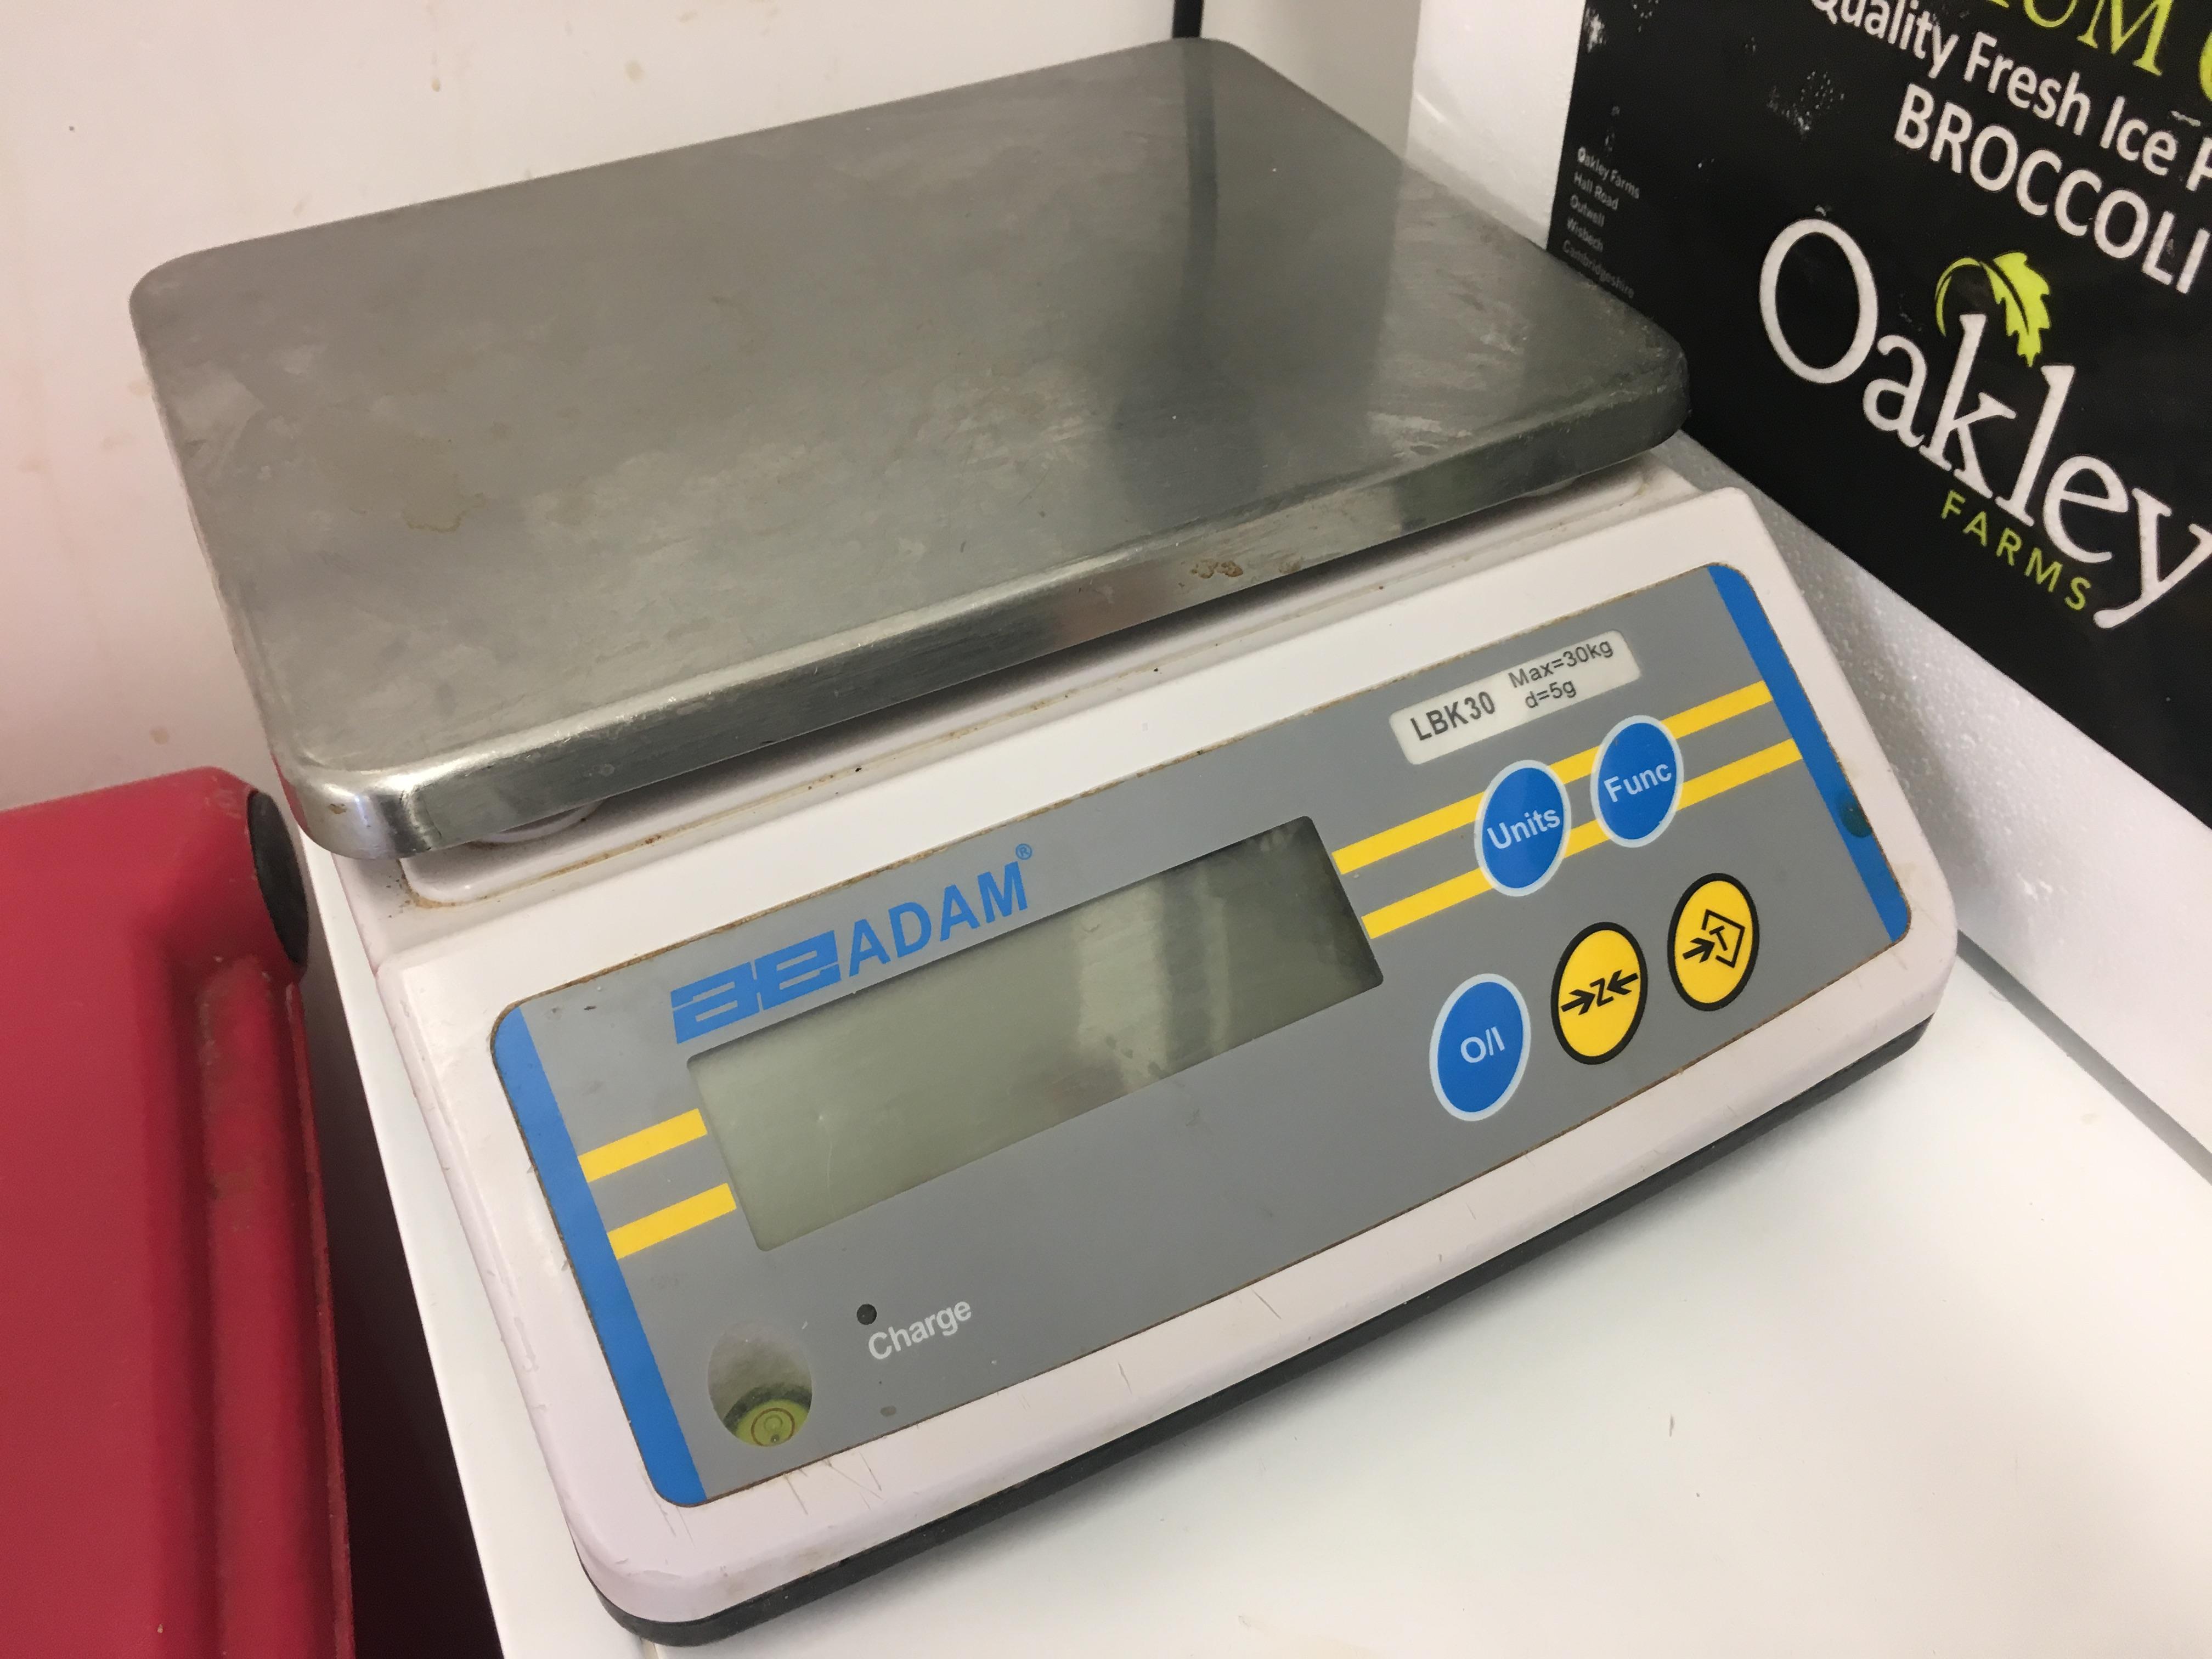 Lot 3 - A E Adam Electronic weighing scale